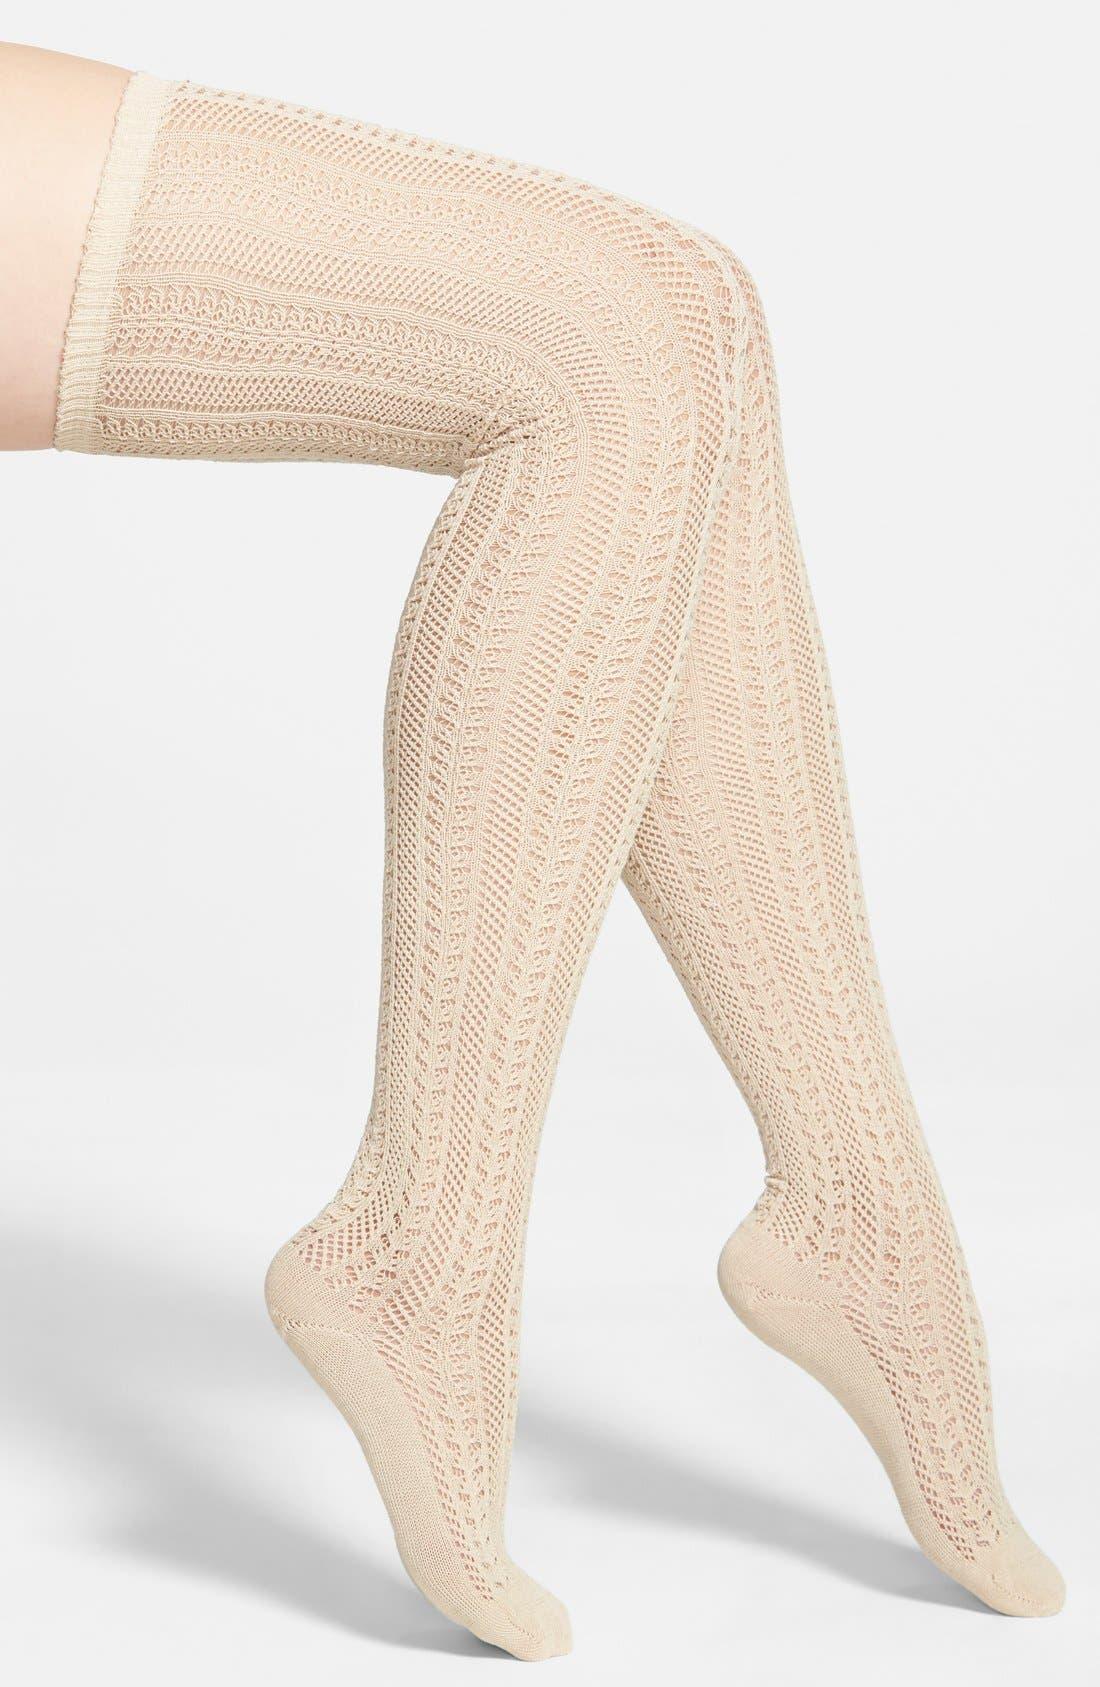 Main Image - Free People 'Hammock' Openwork Knit Thigh High Socks